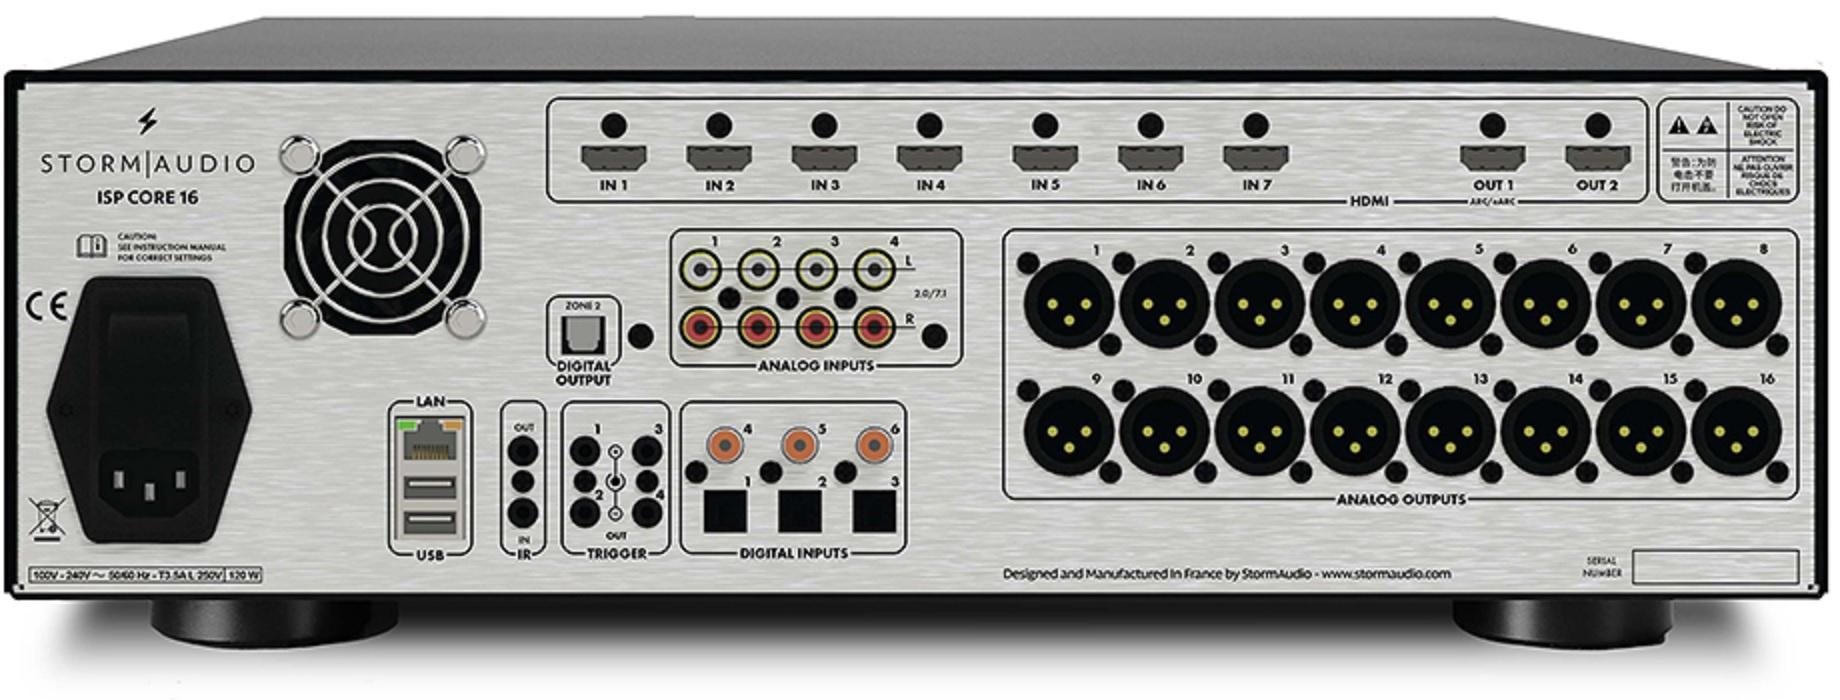 StormAudio ISP CORE 16 csatlakozók